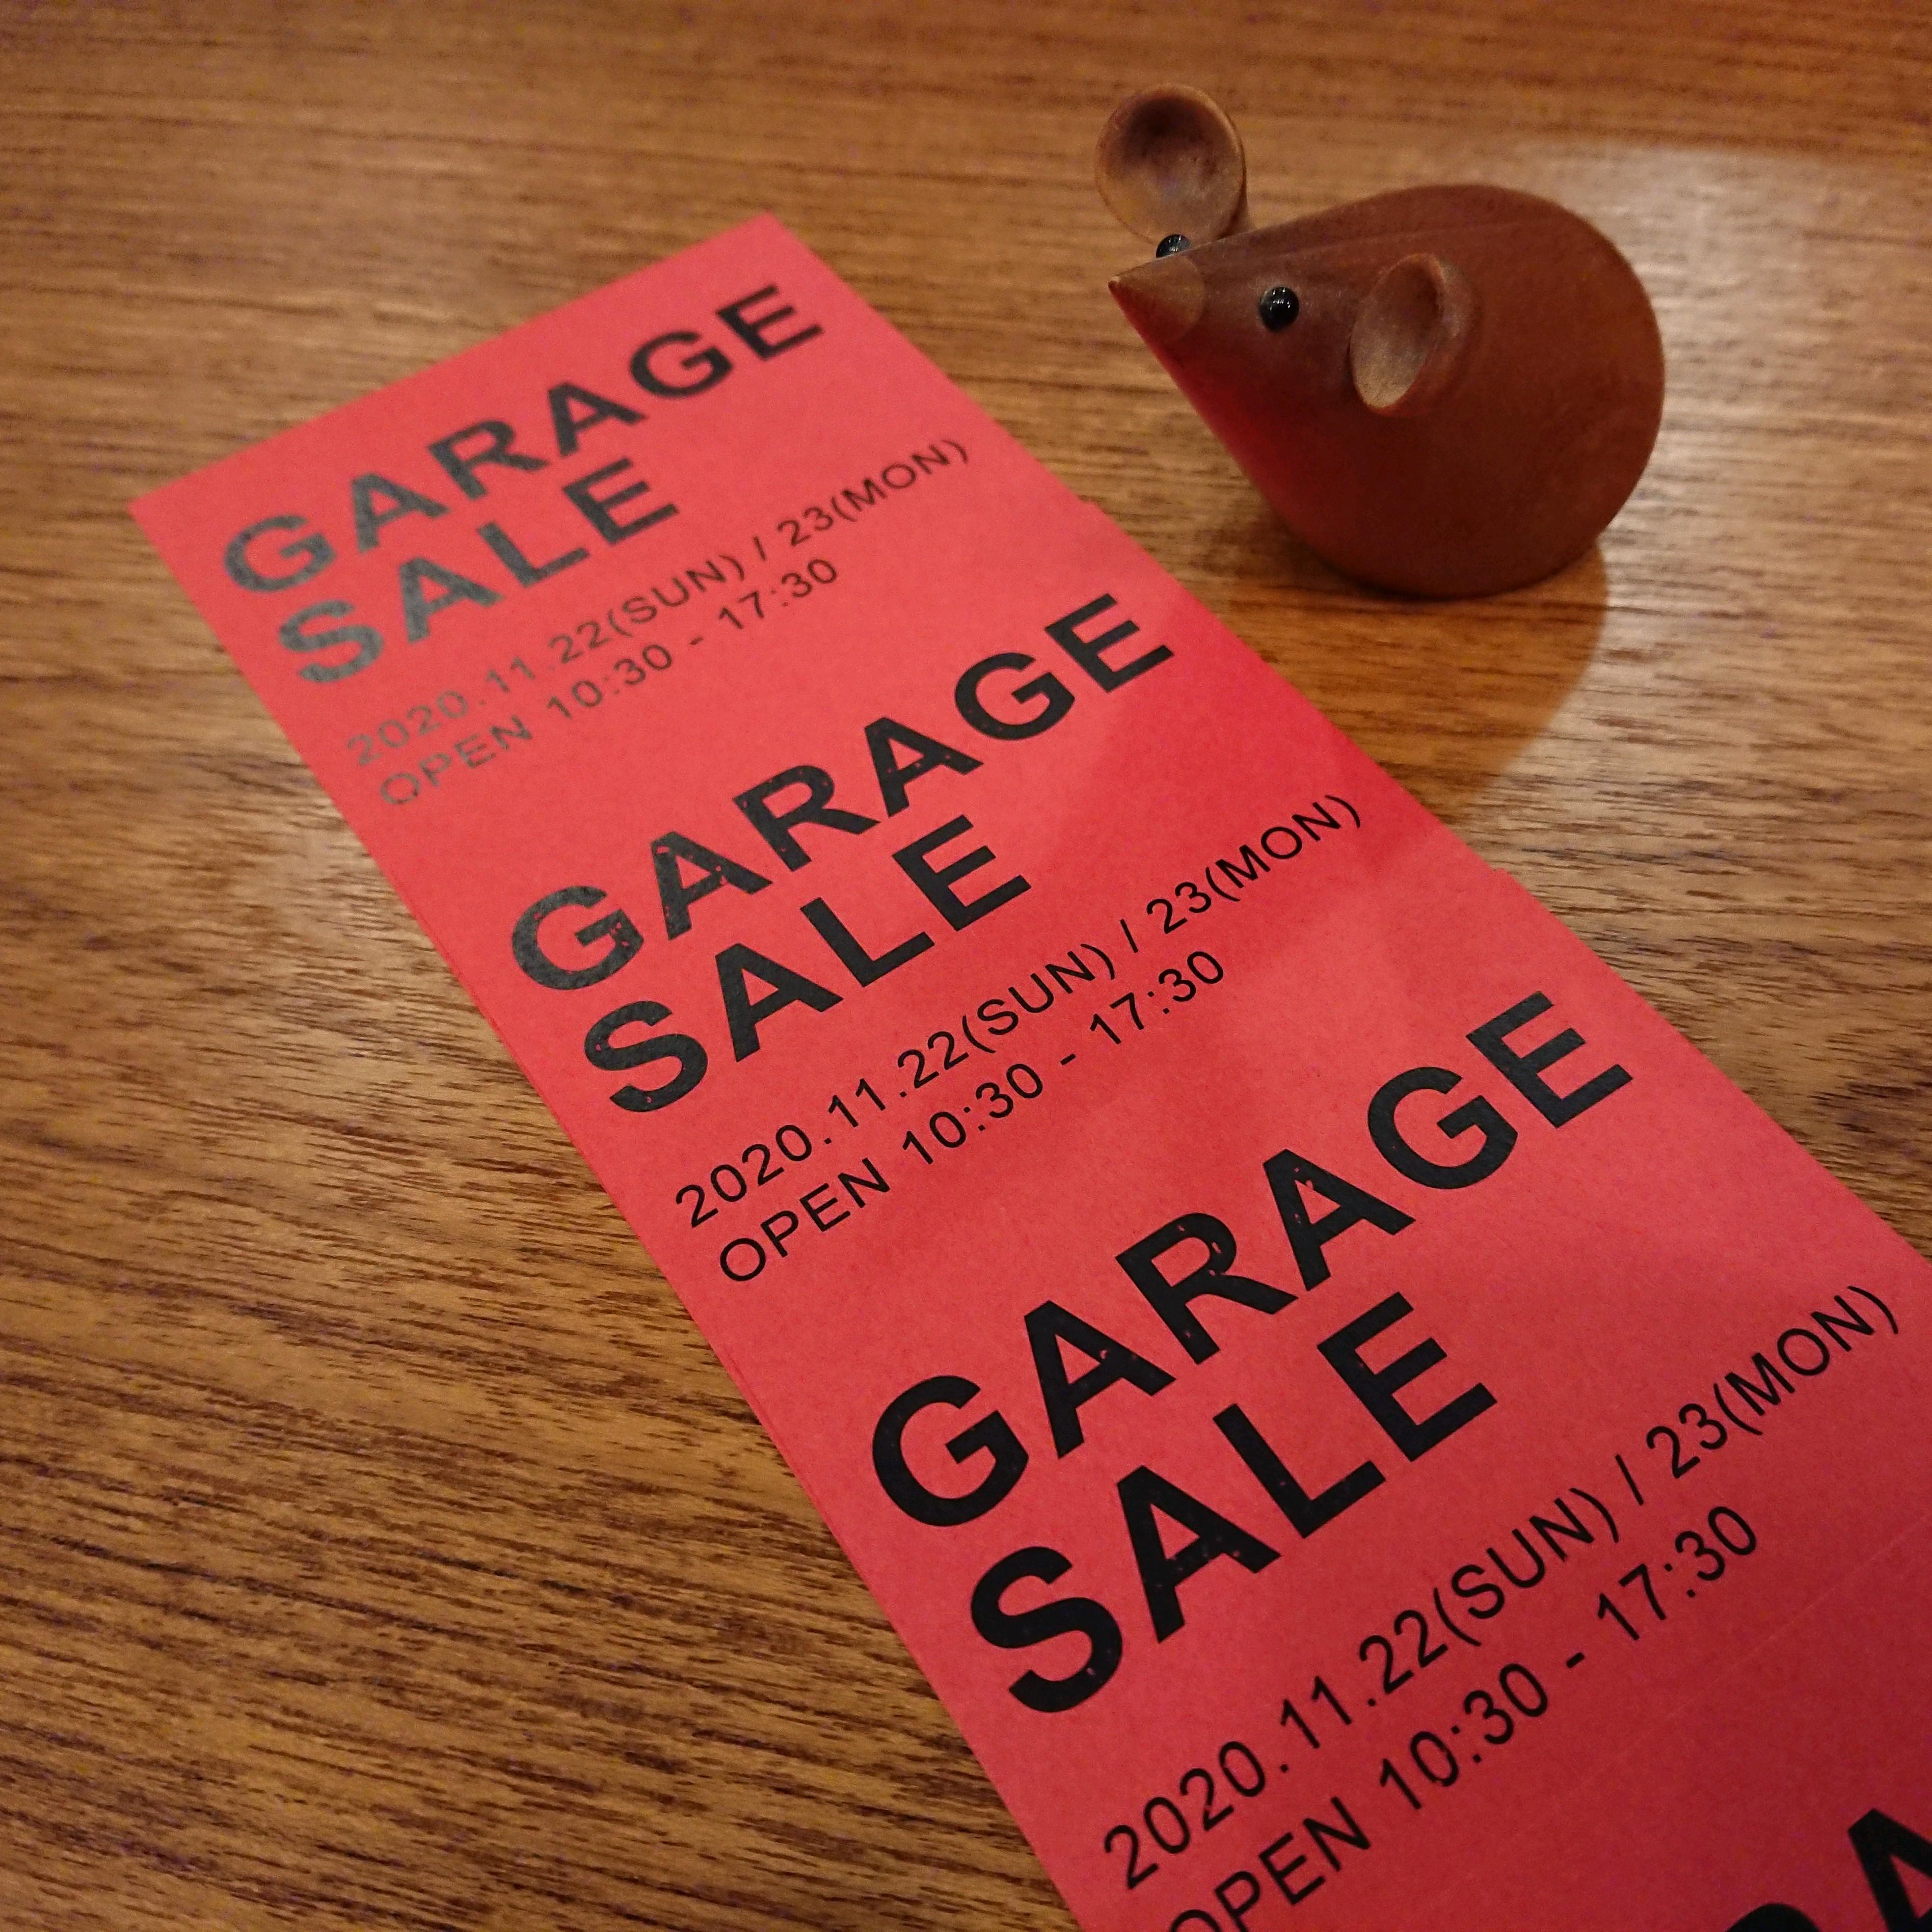 11/22(SUN)・23(MON)の2日間、轂初のガレージセールを開催します